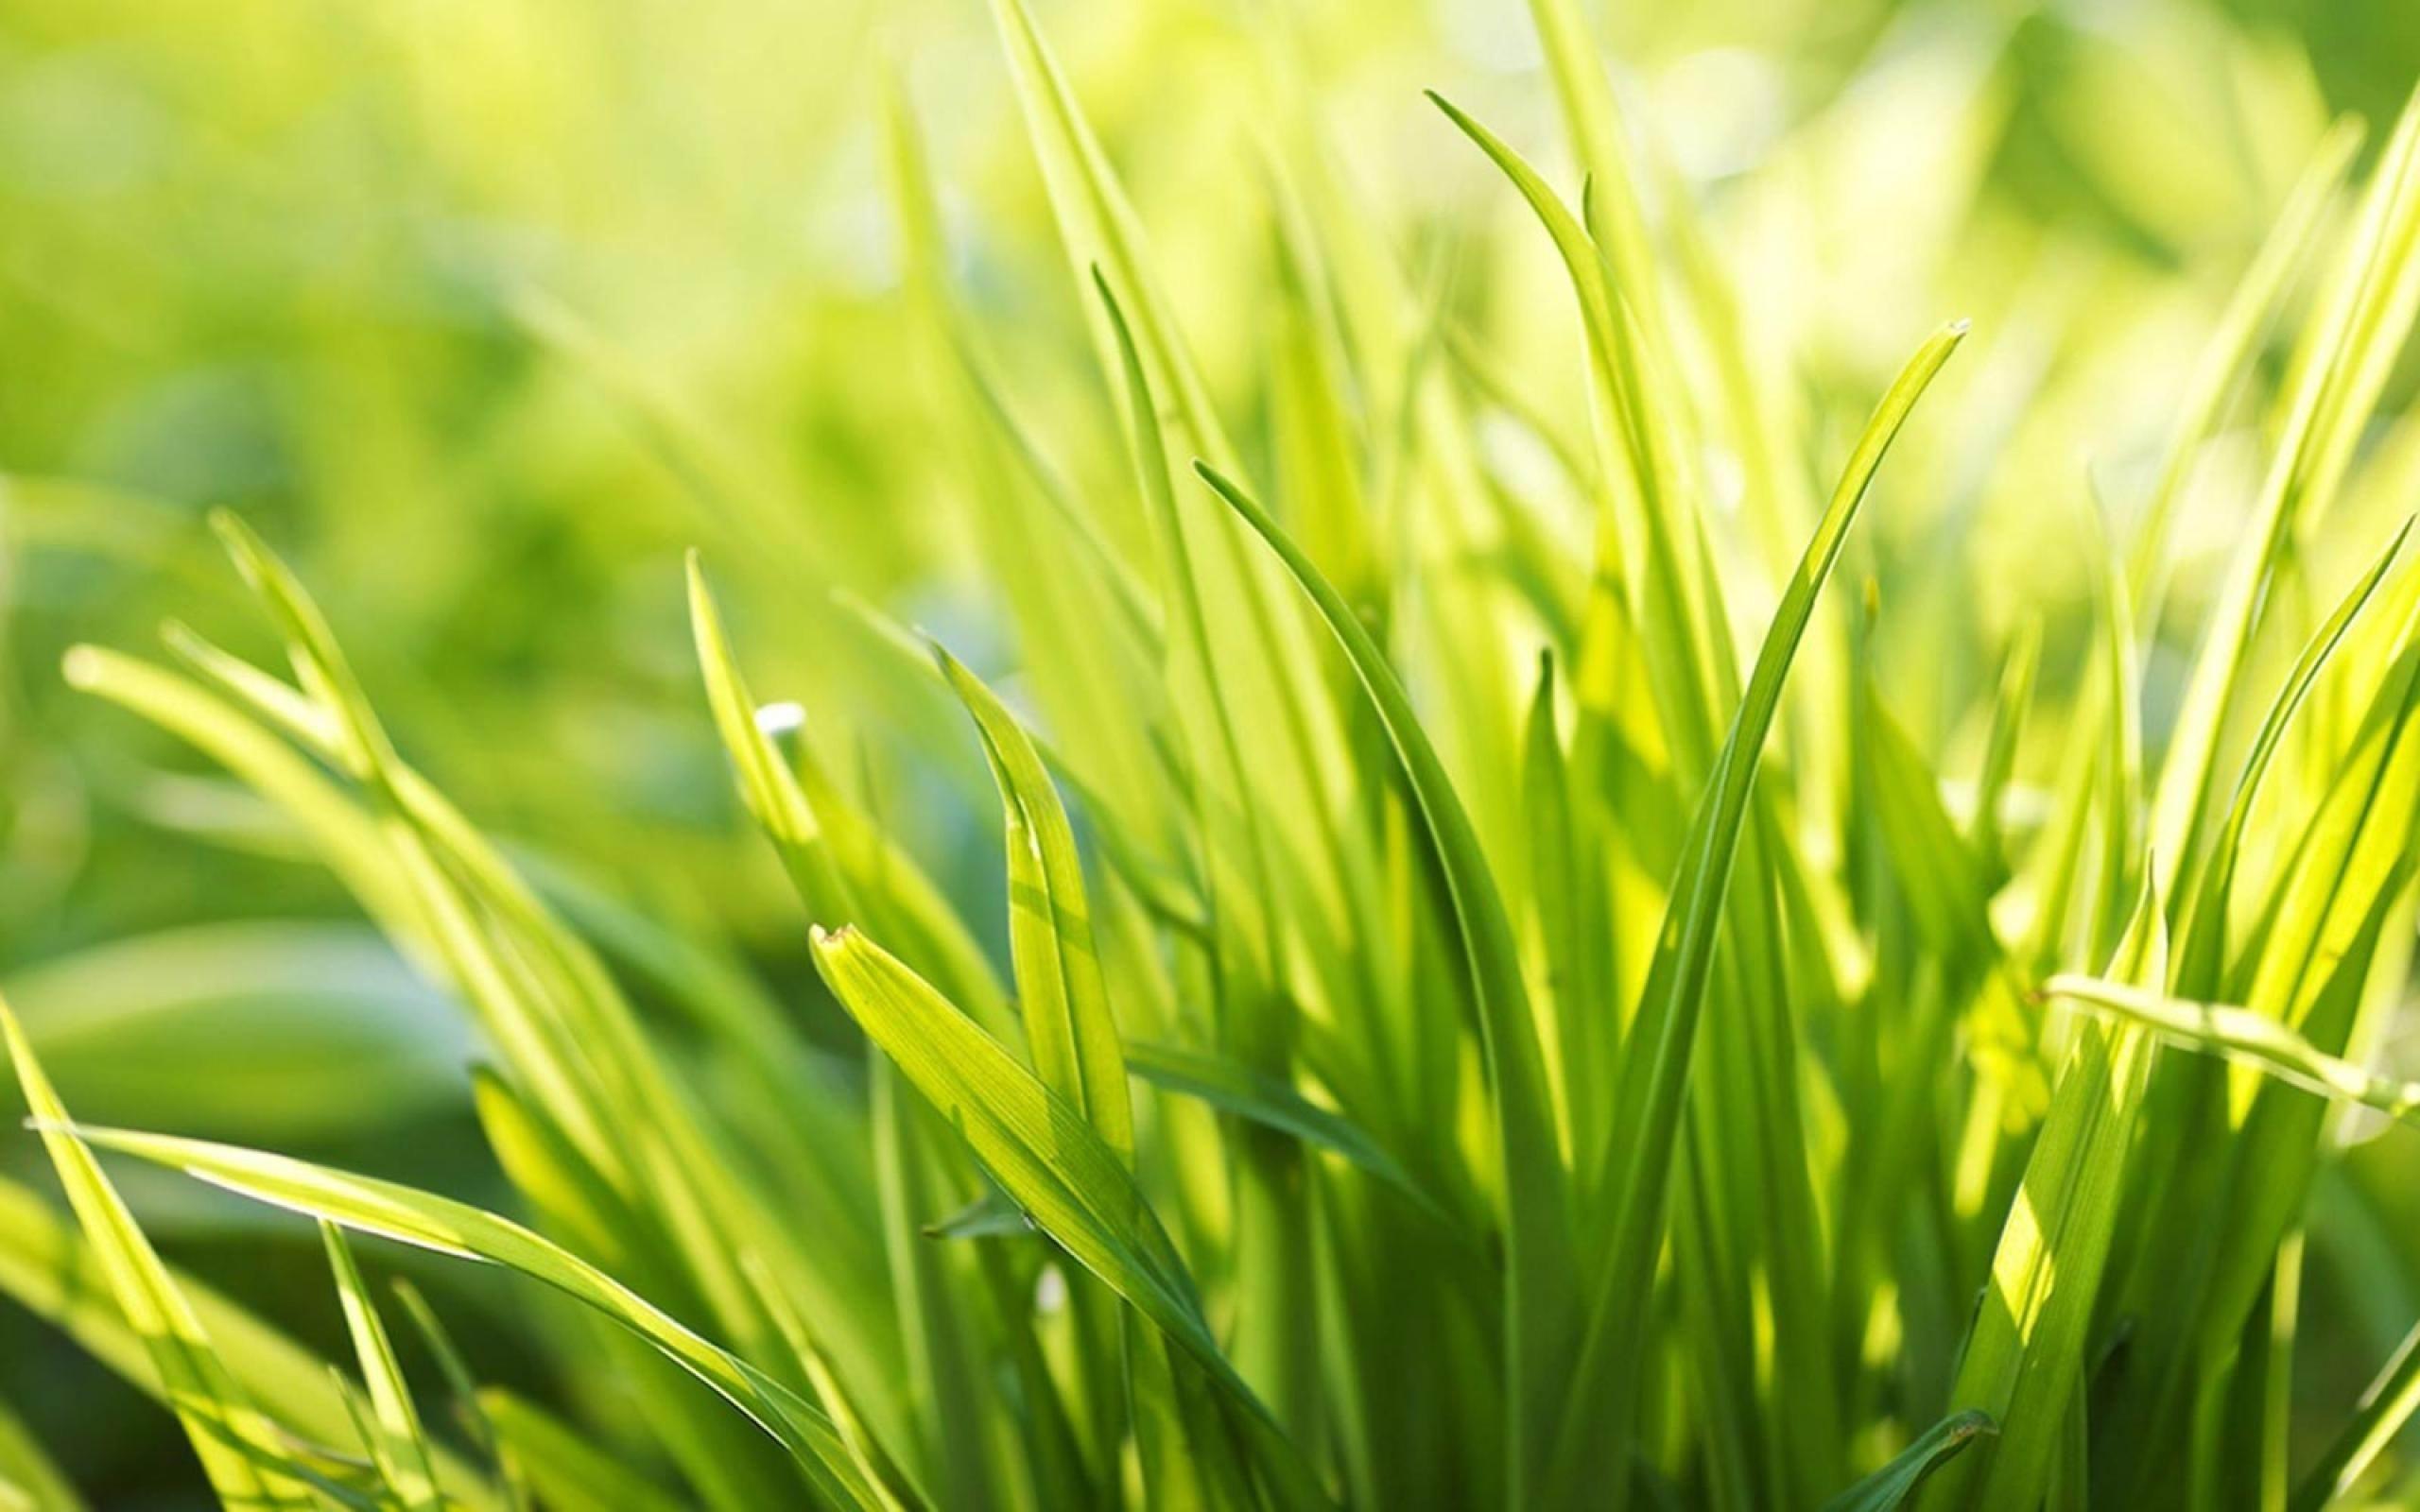 Herbe soleil nature plante fond d 39 cran 2560x1600 for Plante herbe haute